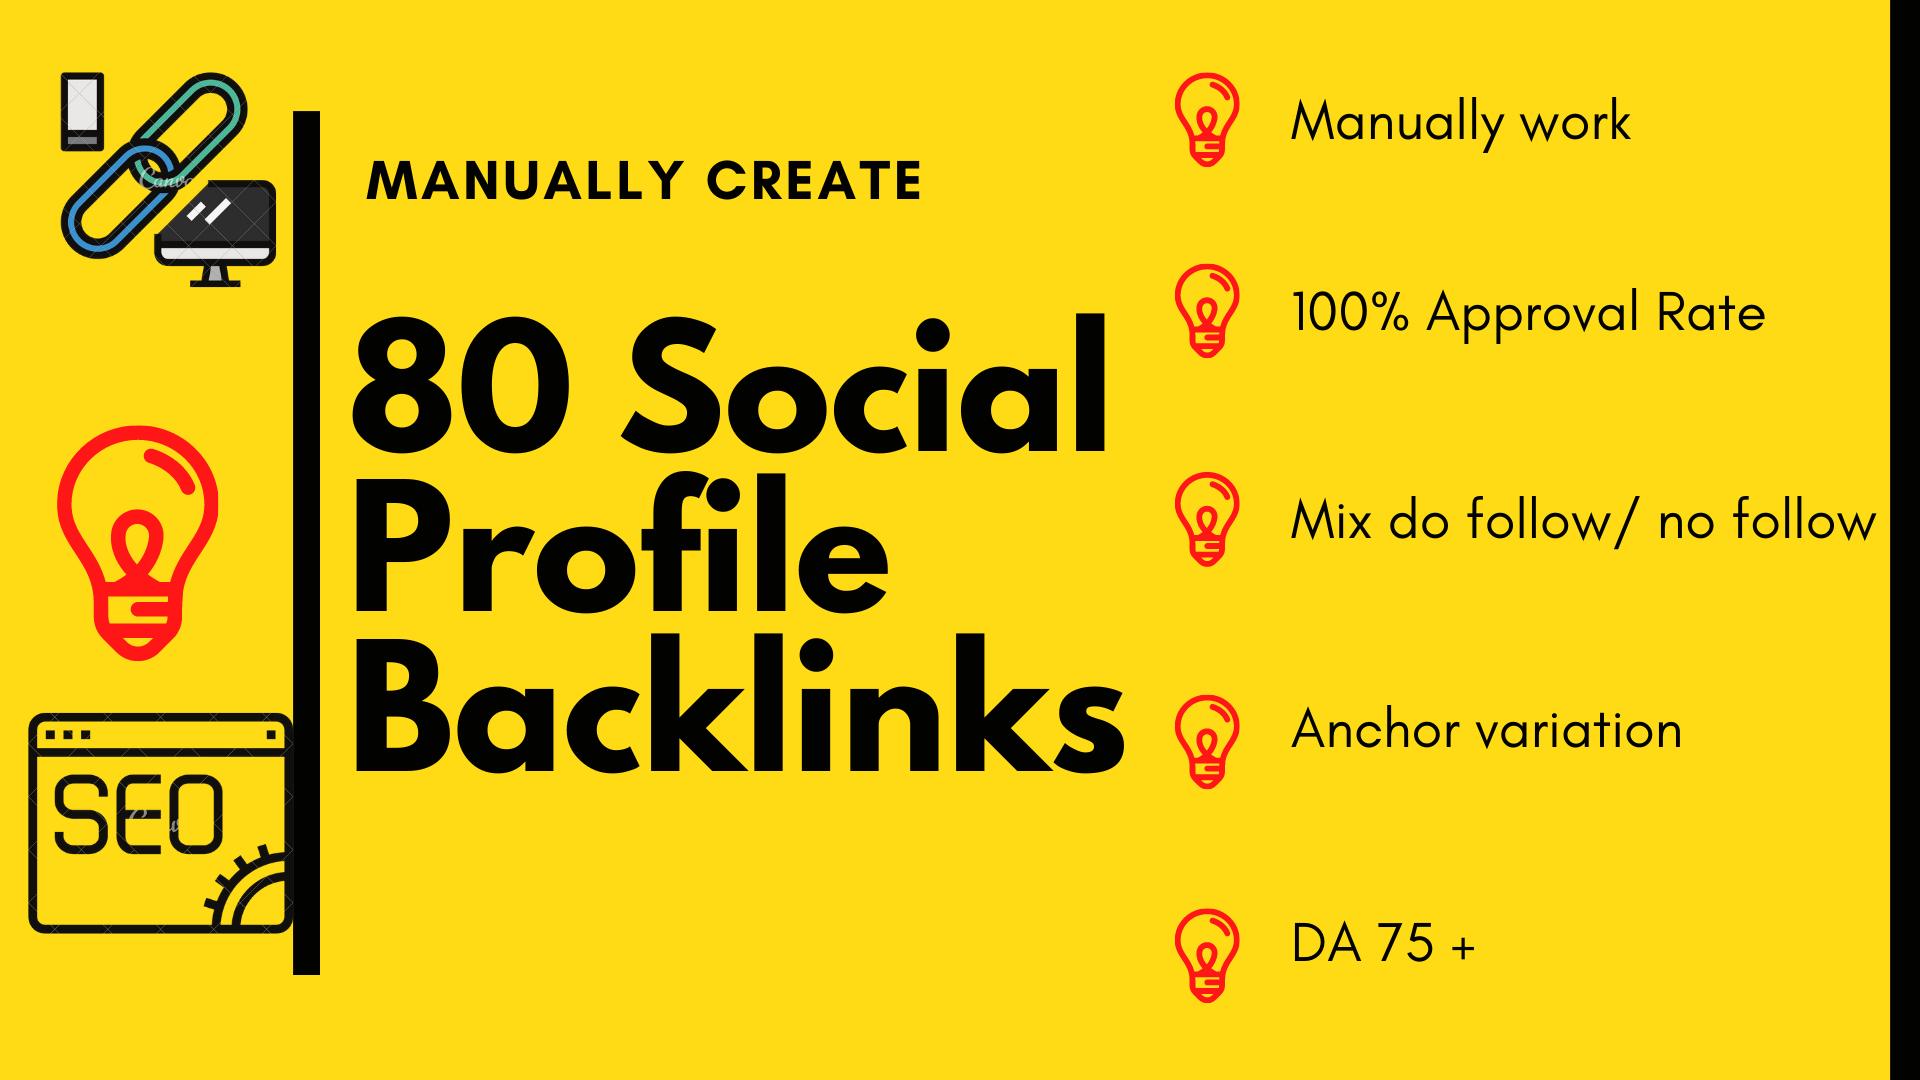 80 Manually created High Authority social Profile Backlinks.